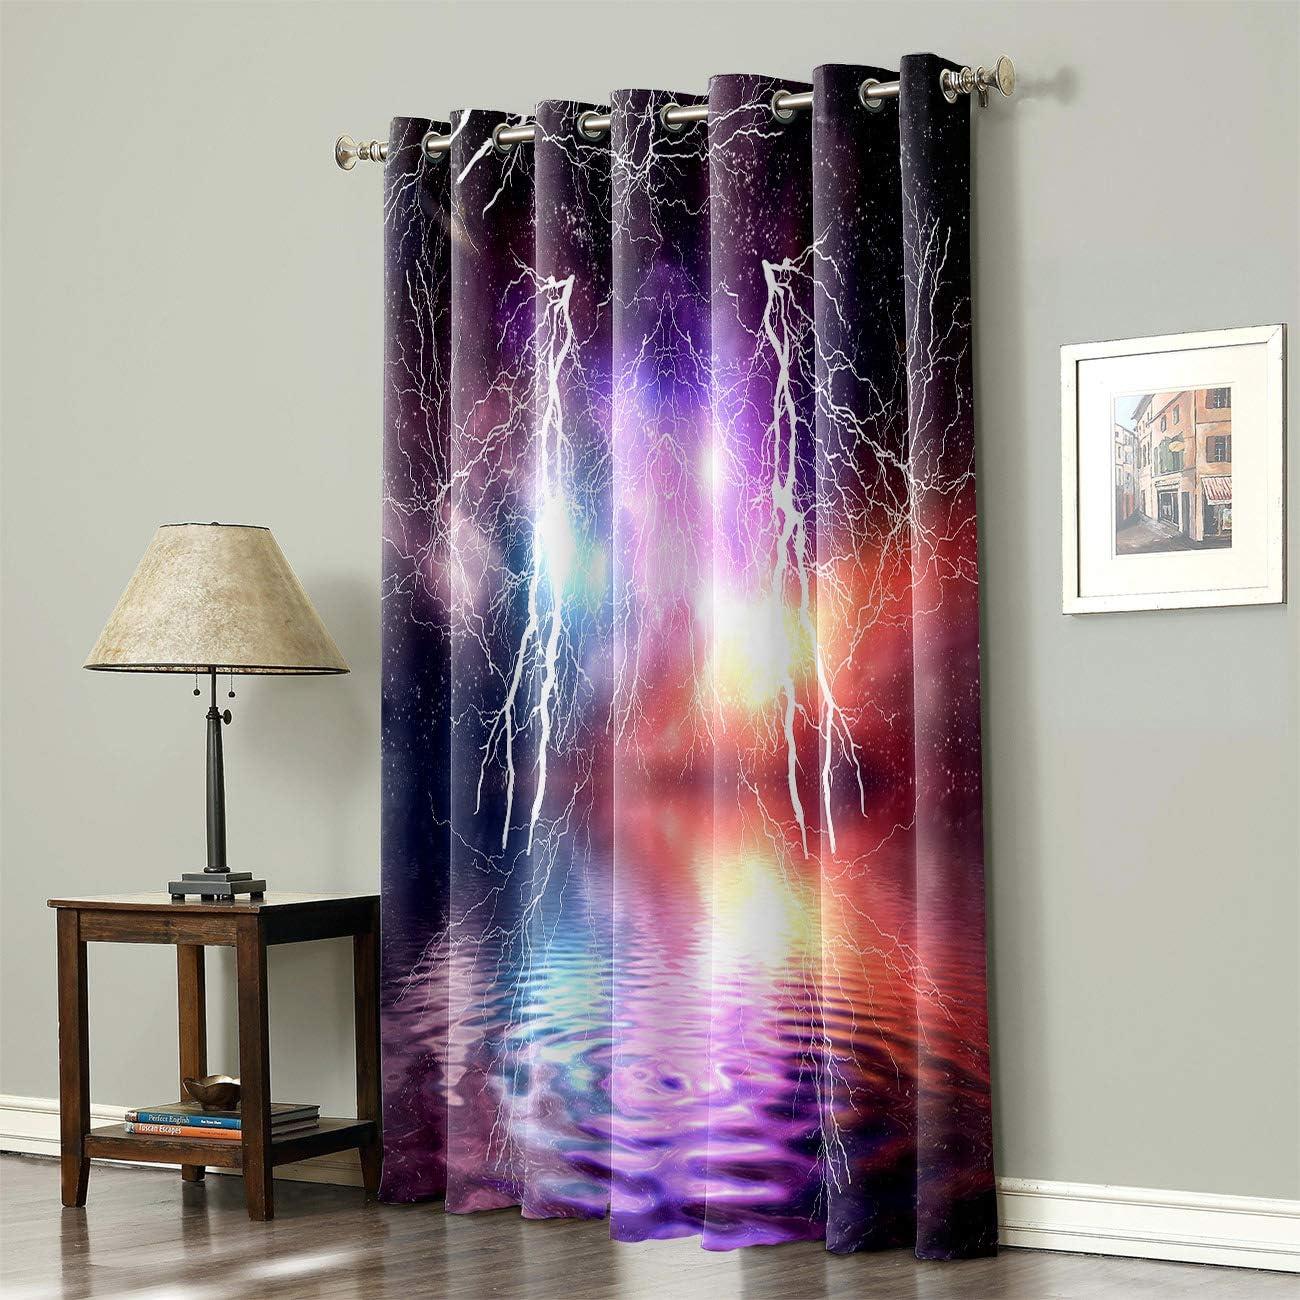 Grommet Top Curtains for Living 超人気 専門店 Room ☆送料無料☆ 当日発送可能 Treatment Window Bedroom Cu